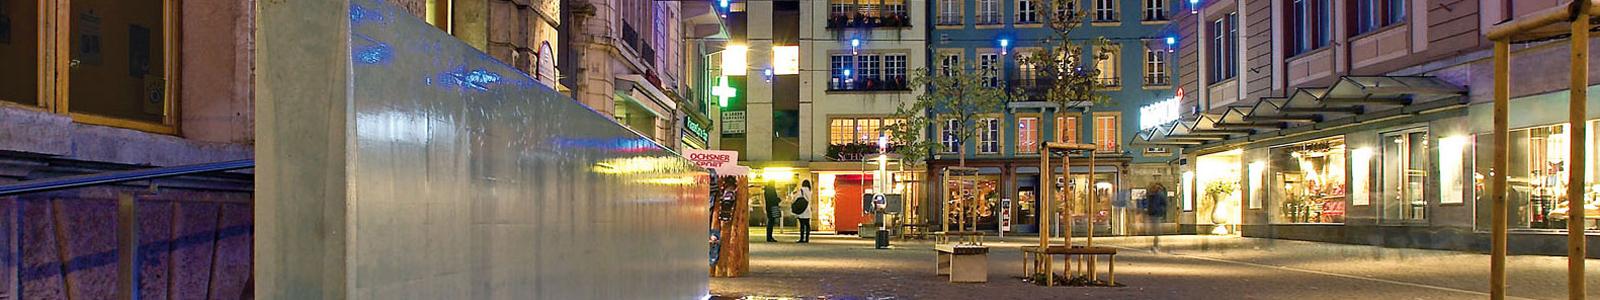 Gerofinance agence immobili re yverdon contact yverdon for A louer appartement a yverdon